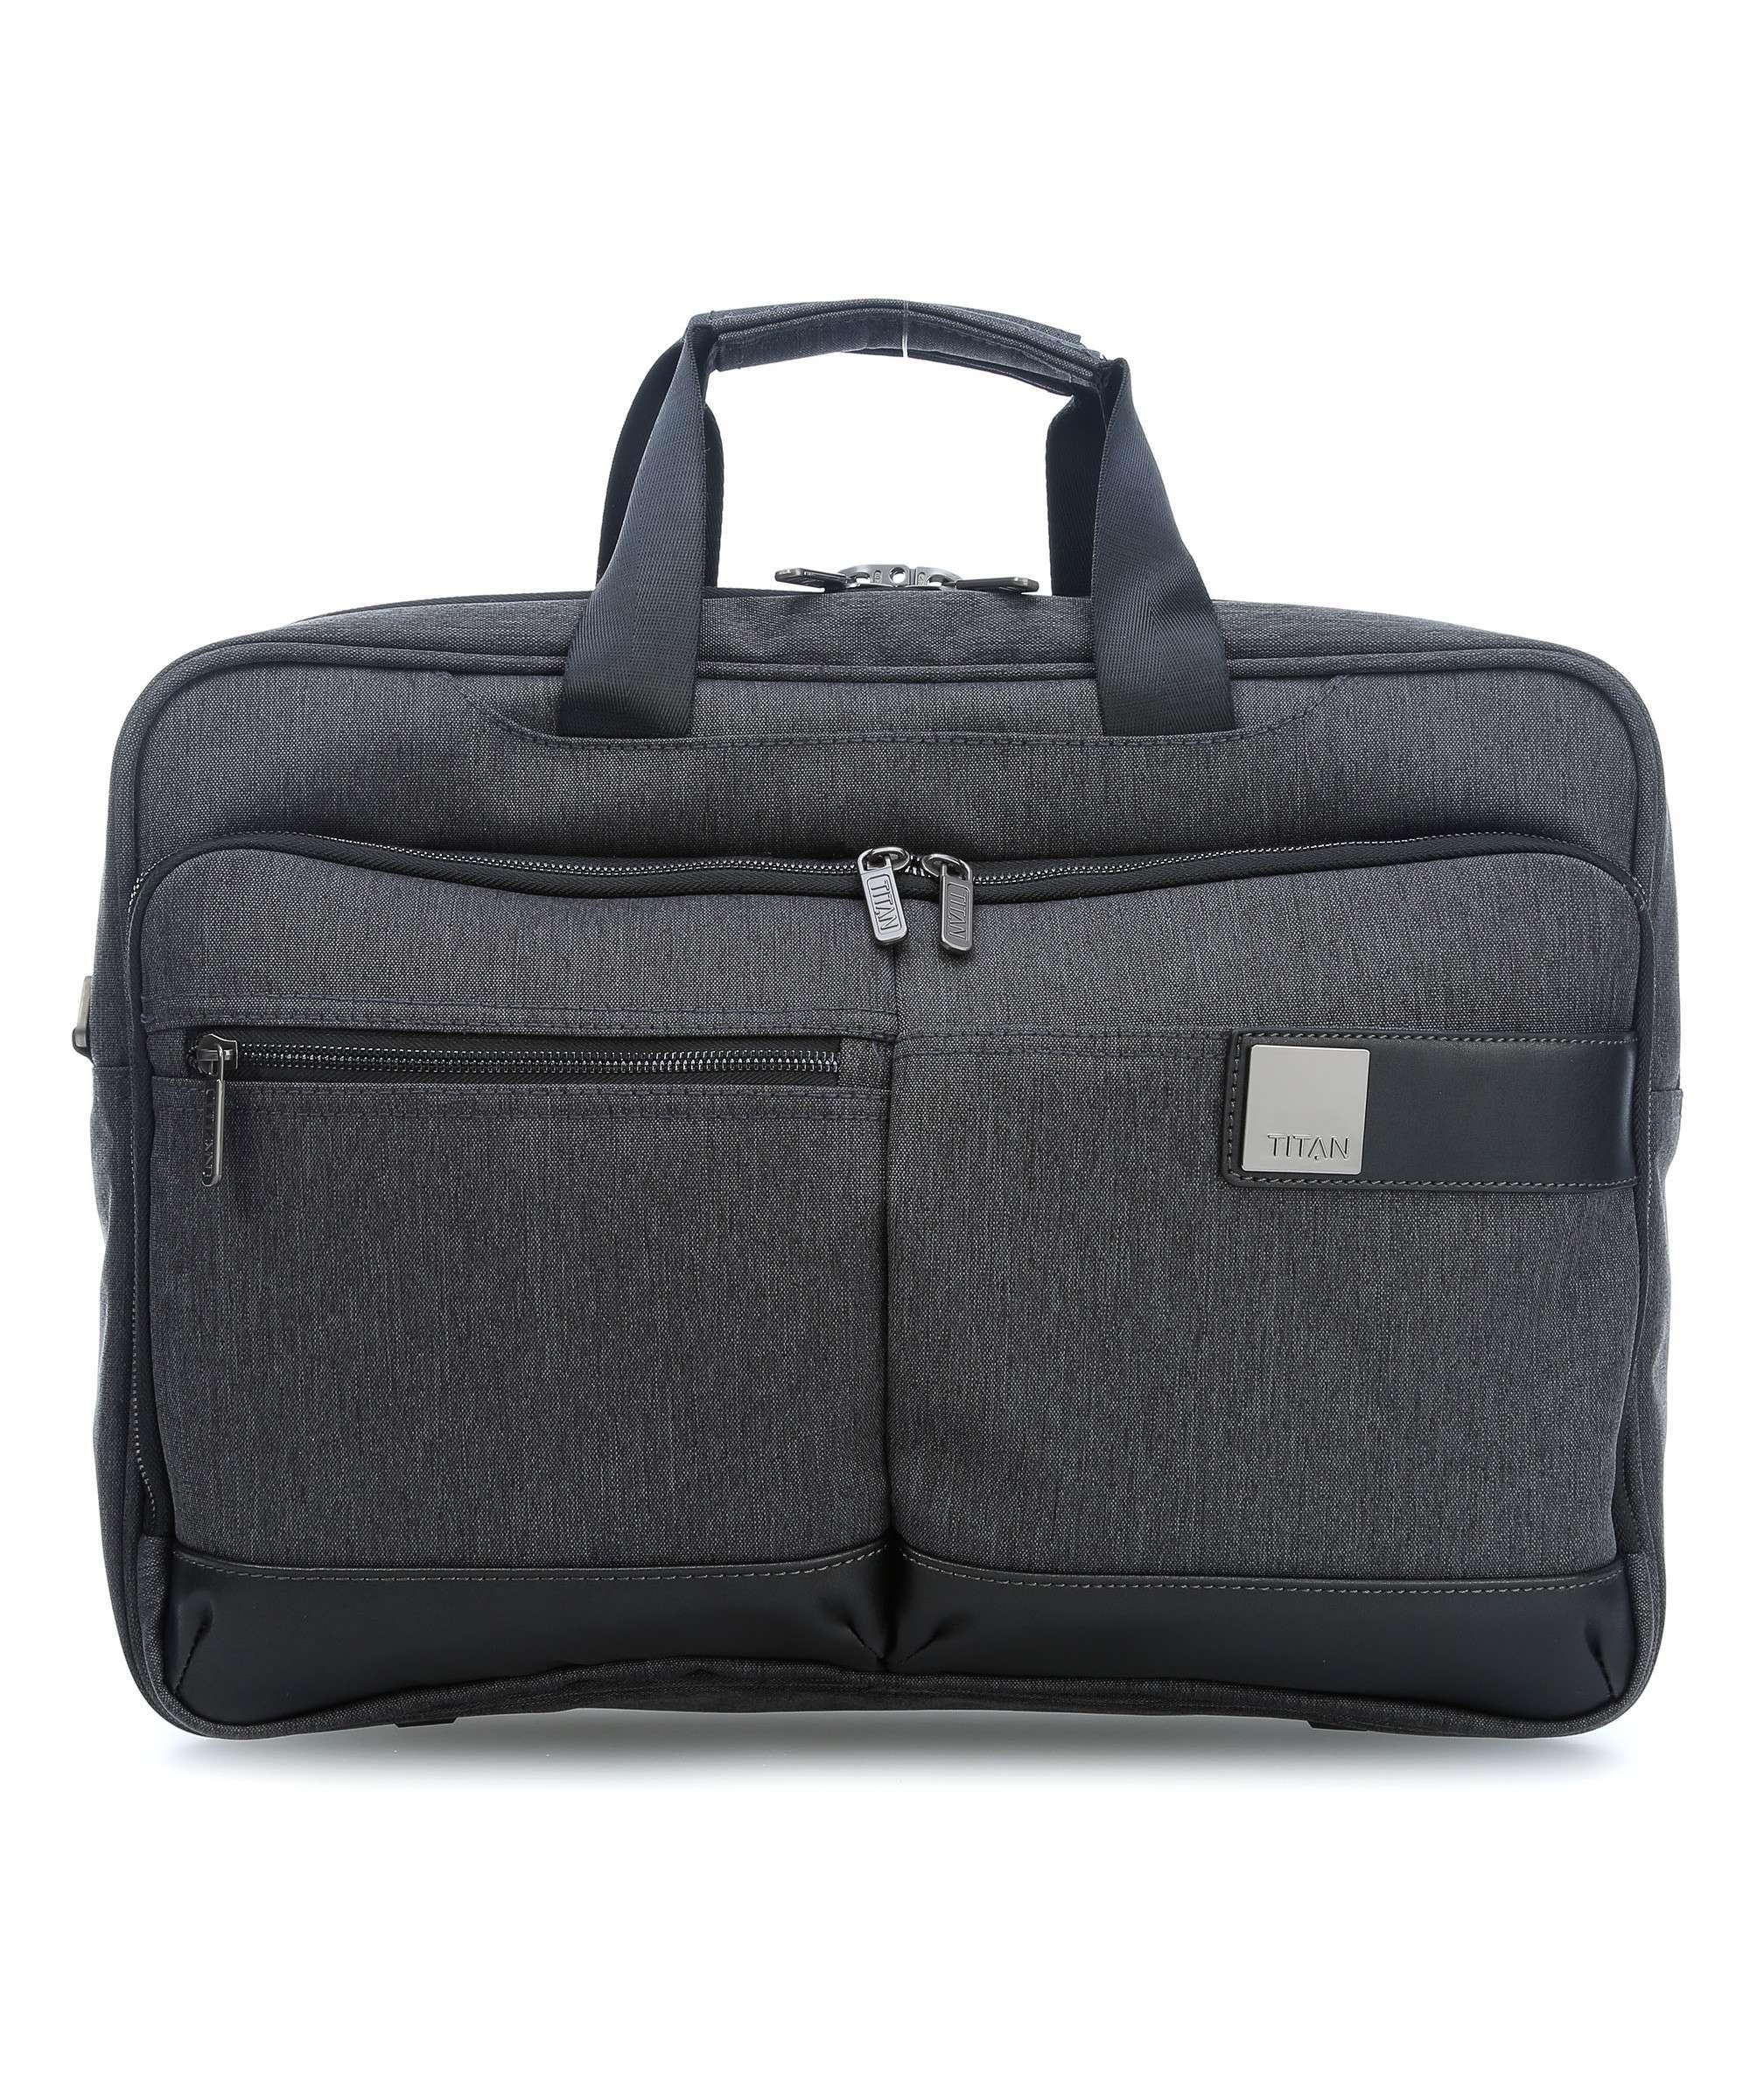 Geanta pentru Laptop Titan Power Pack - extensibila